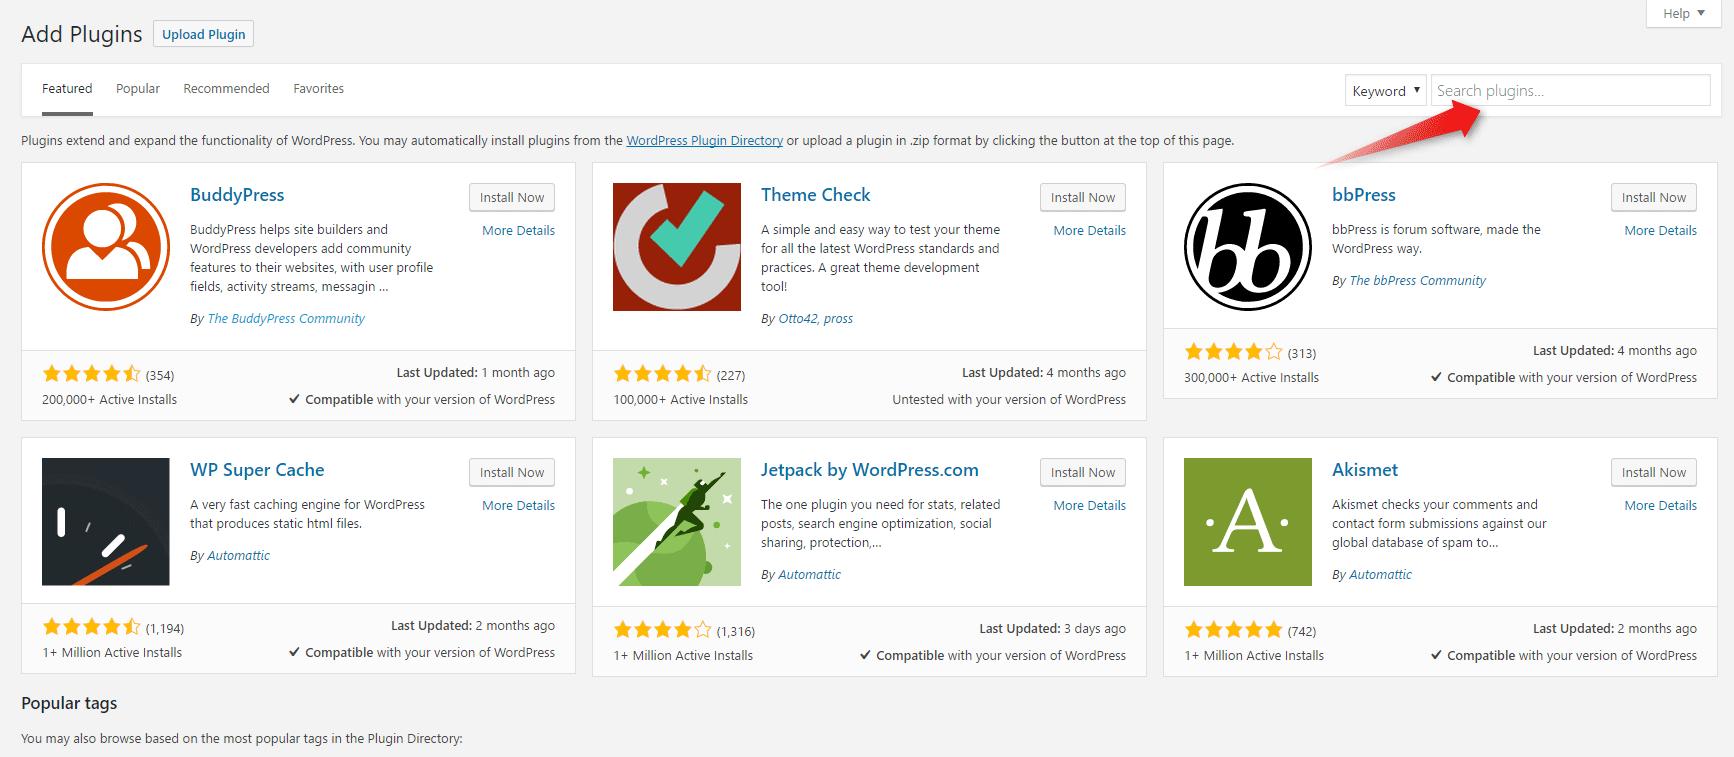 How to Add Plugins to WordPress